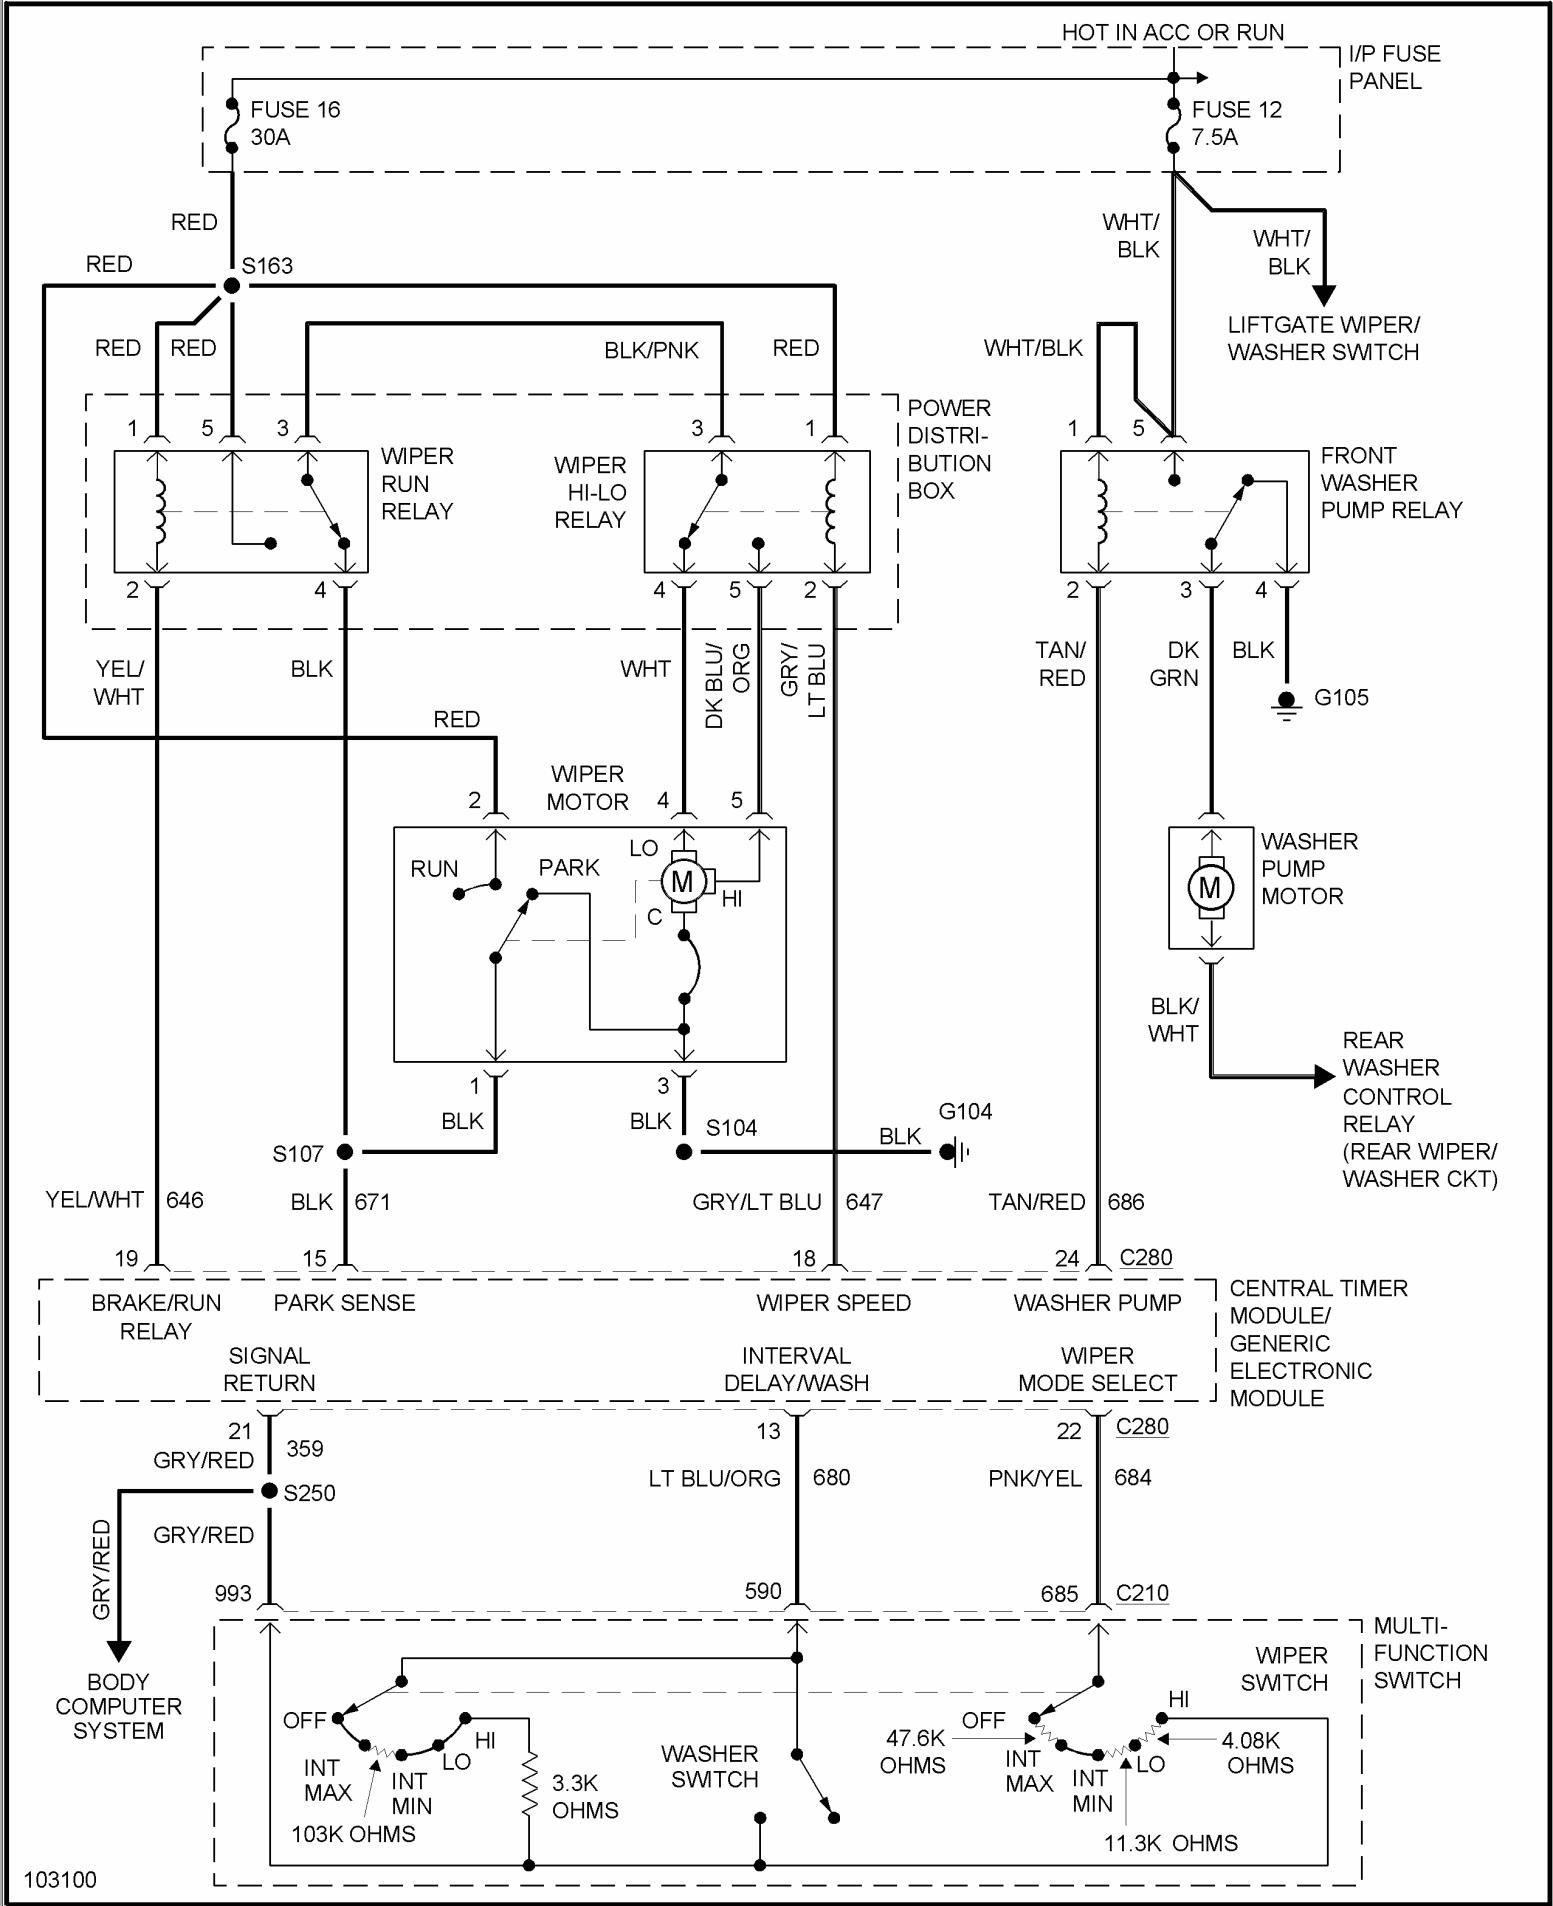 Mazda Wiper Motor Wiring Diagram Wiring Diagram Corsa Corsa Pasticceriagele It